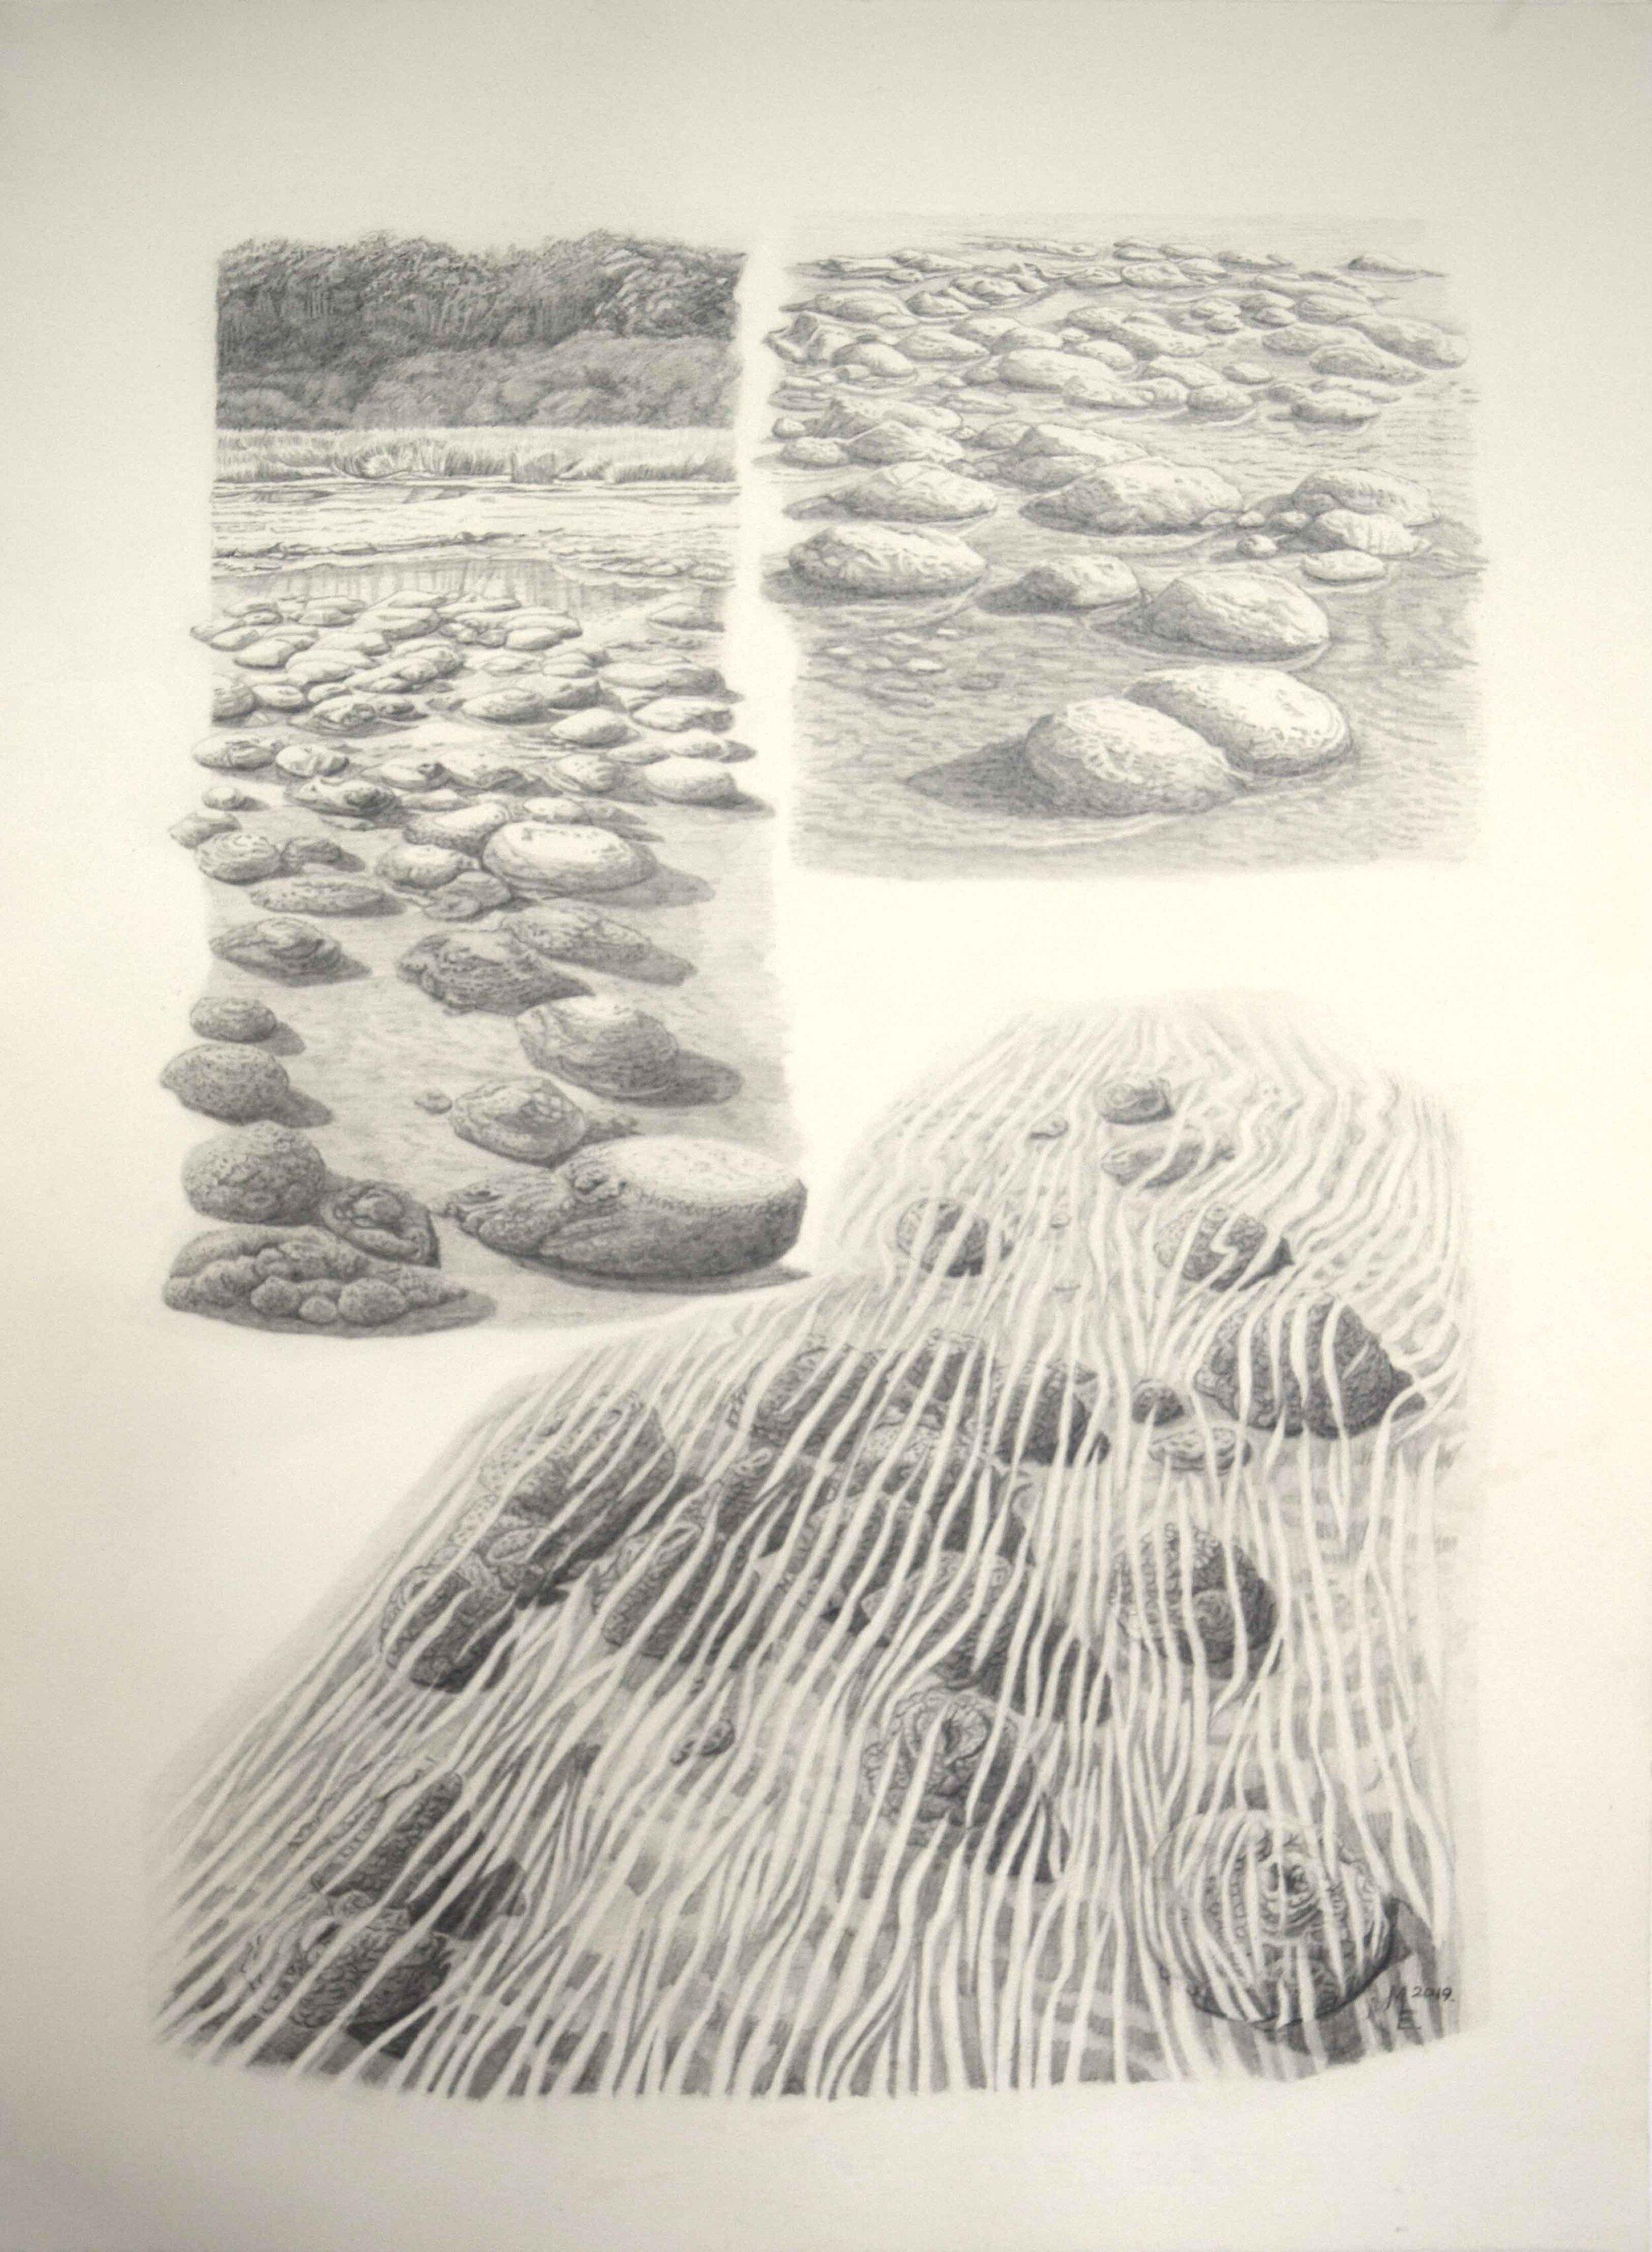 61. Megan Evans, Planimals; Stromatolites and Thrombolites of Lake Clifton and Lake Preston, Western Australia, 2019, pencil on 185gsm watercolour paper, 42 x 28 cm $450